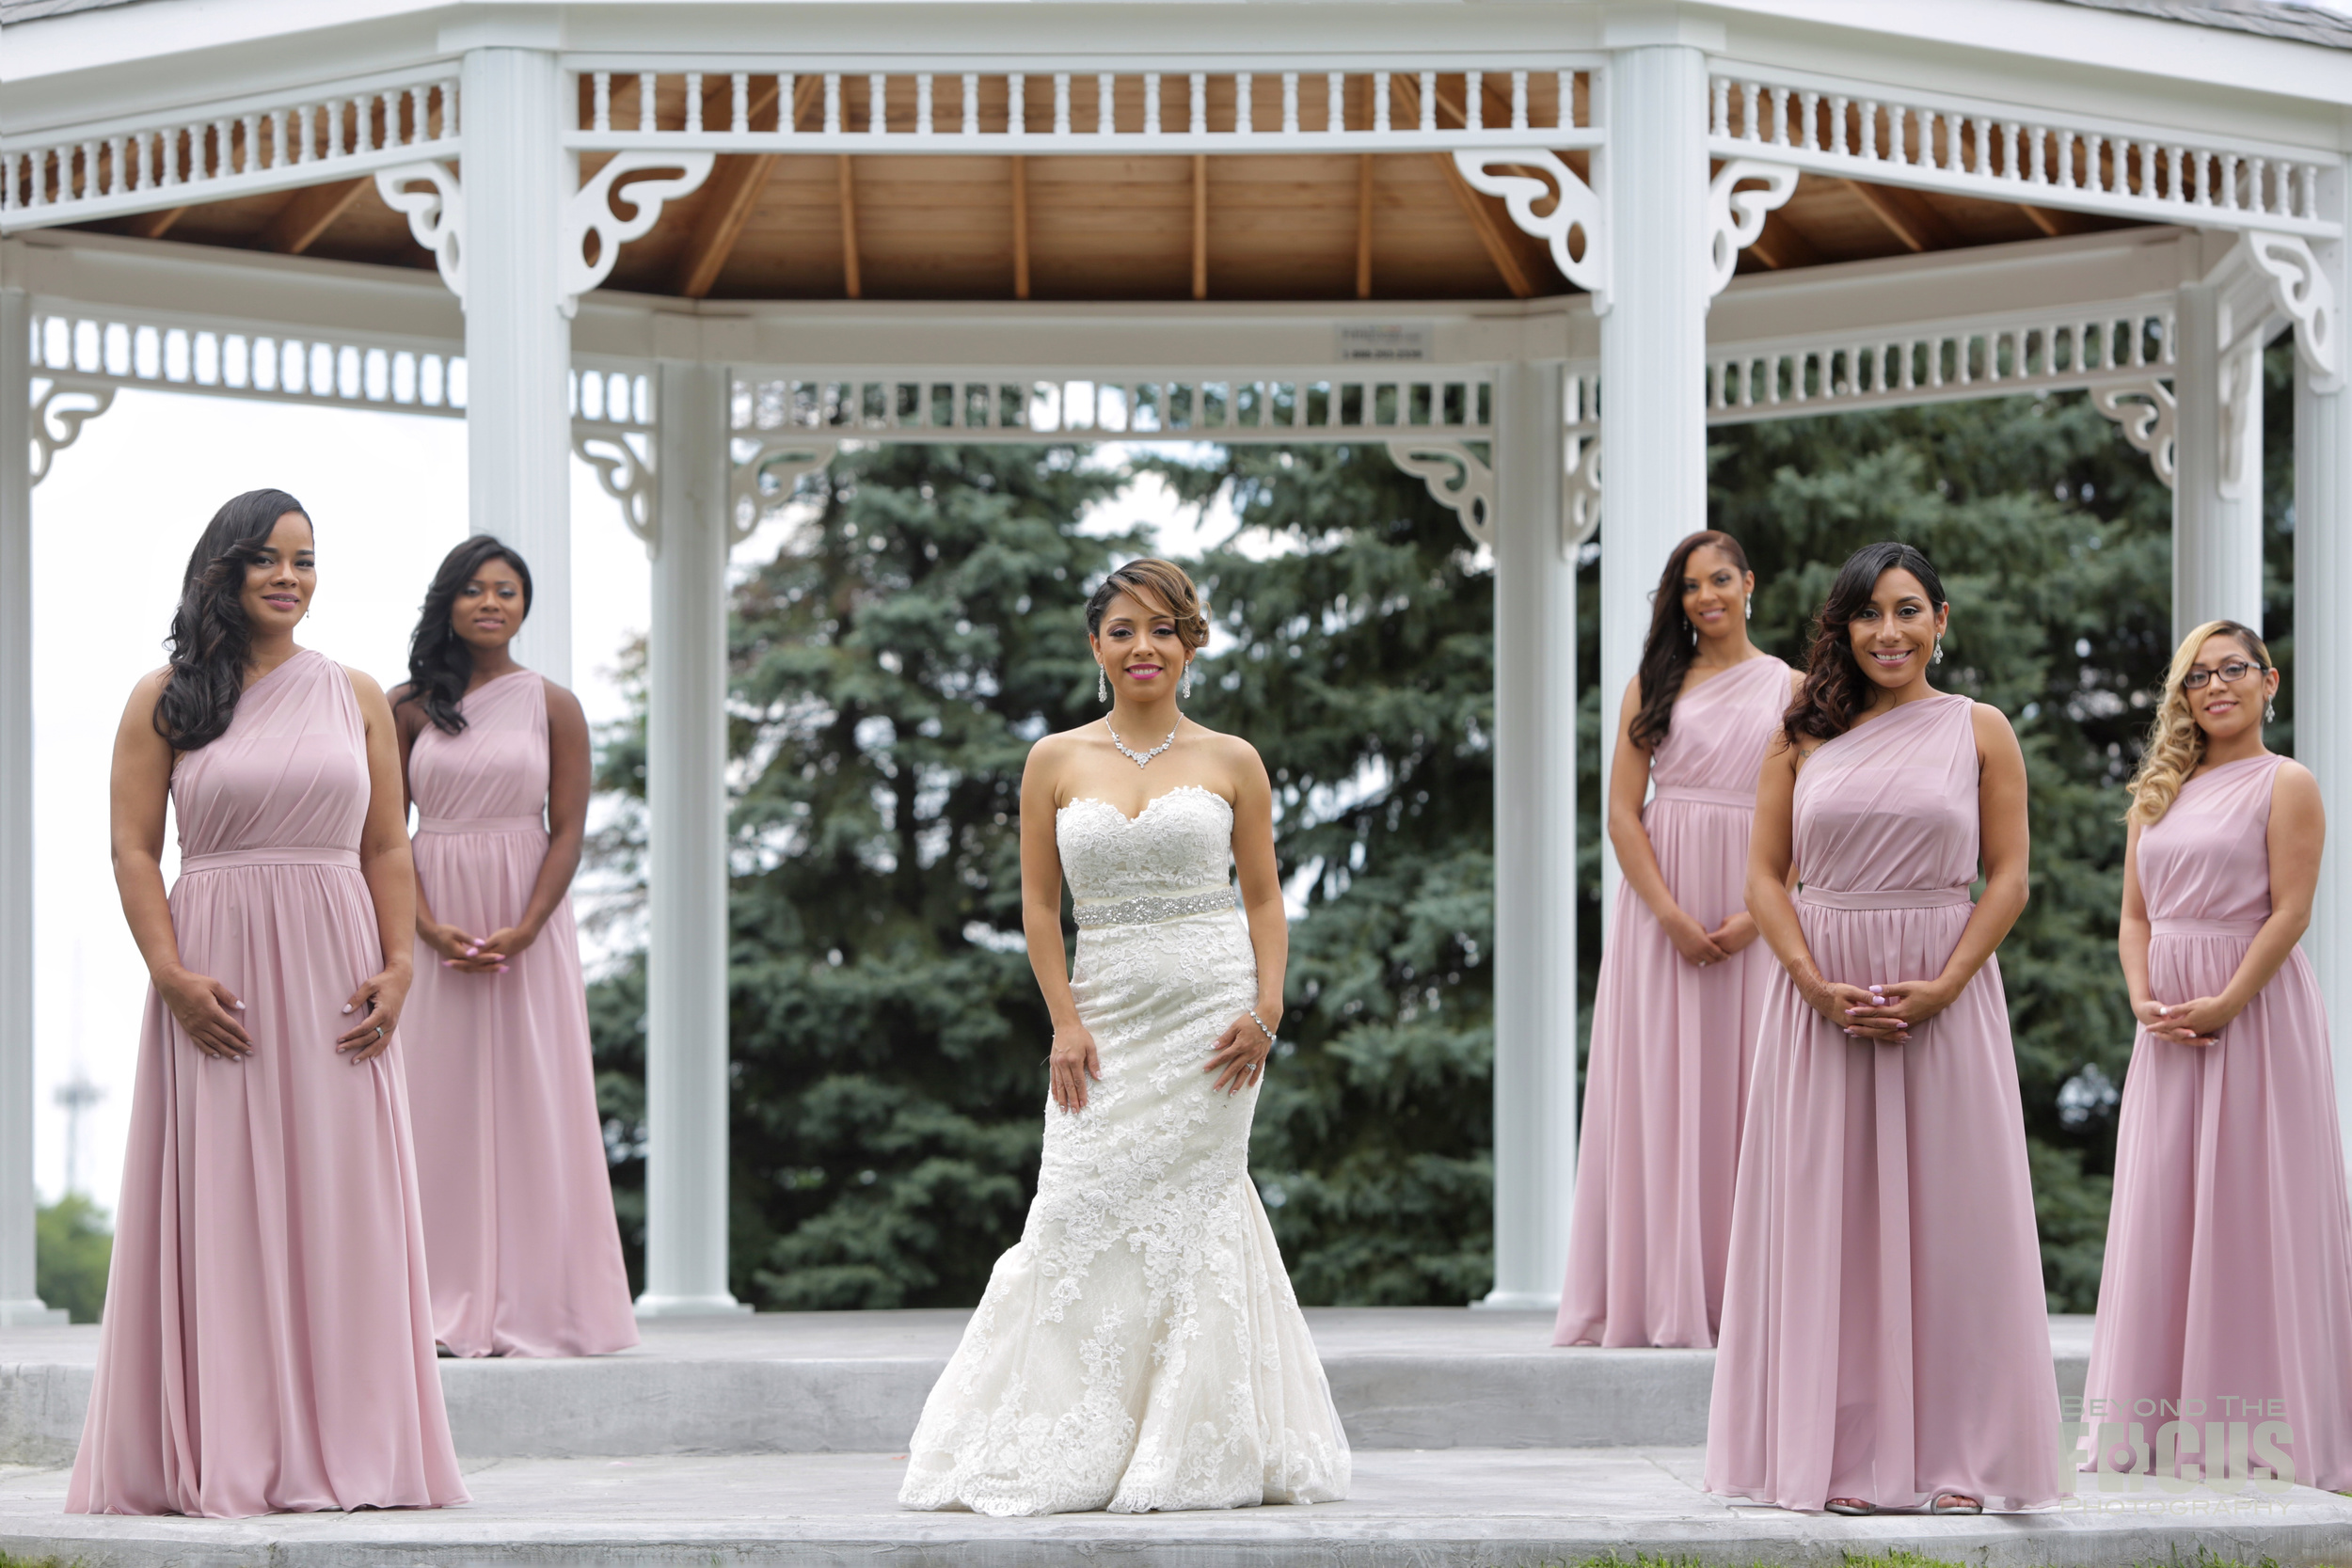 Palmer Wedding - Pre-Wedding Photos 19.jpg